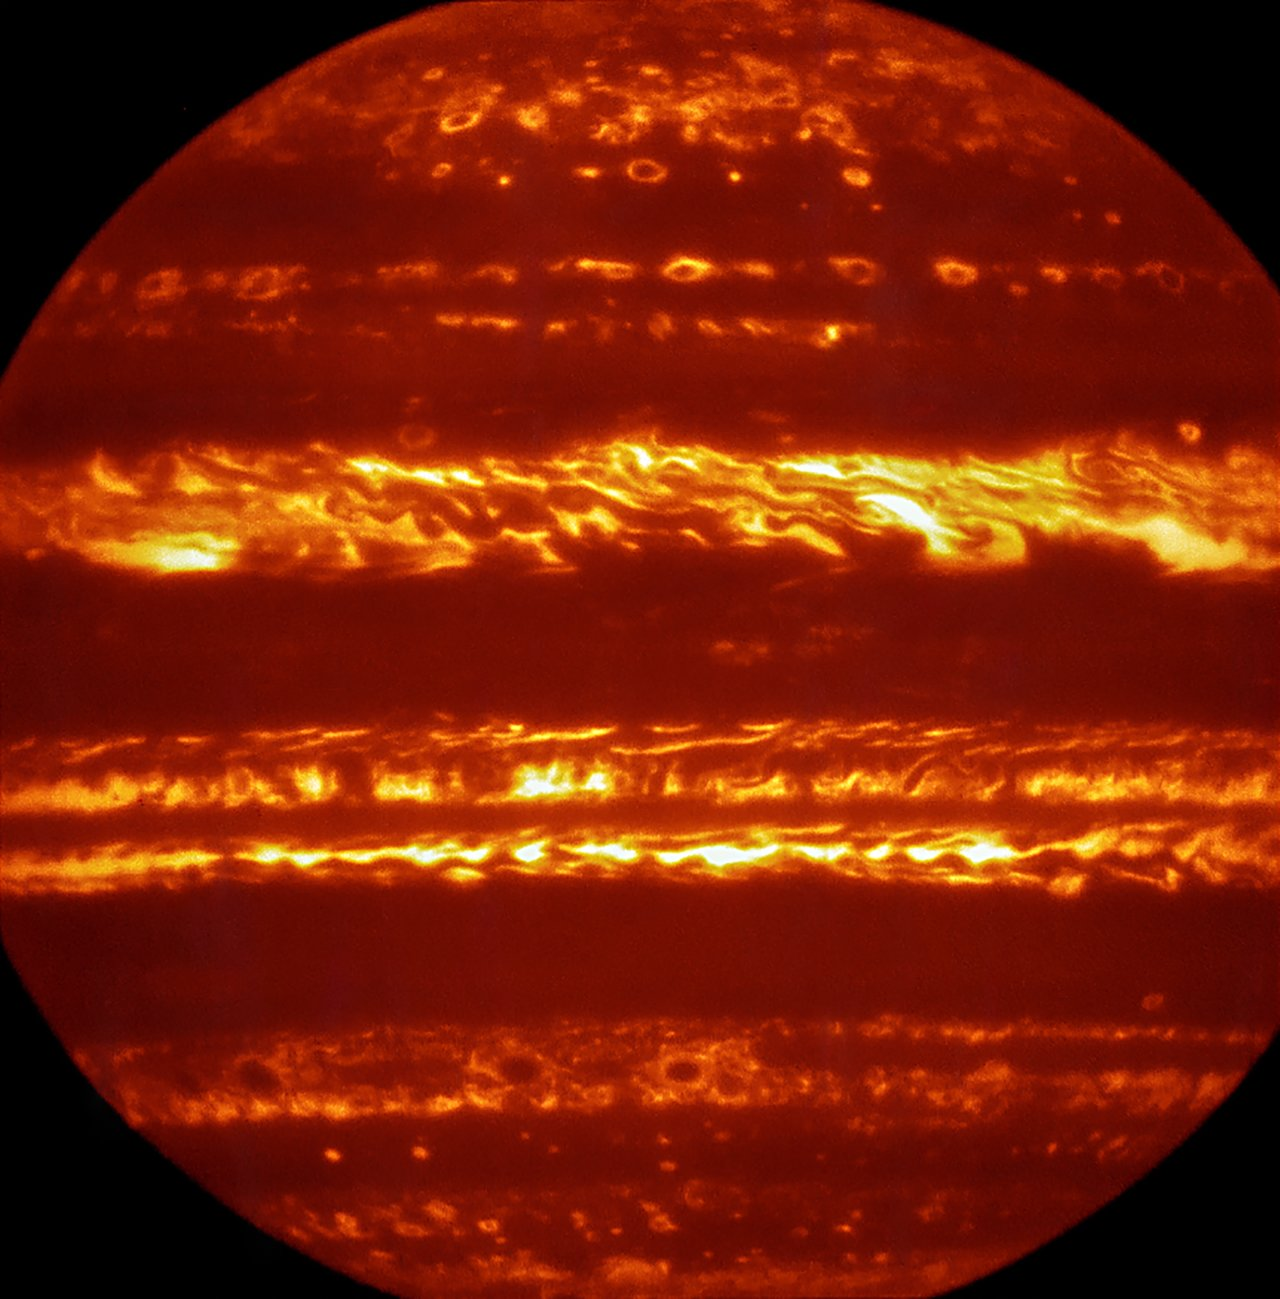 Jupiter Awaits Arrival of Juno